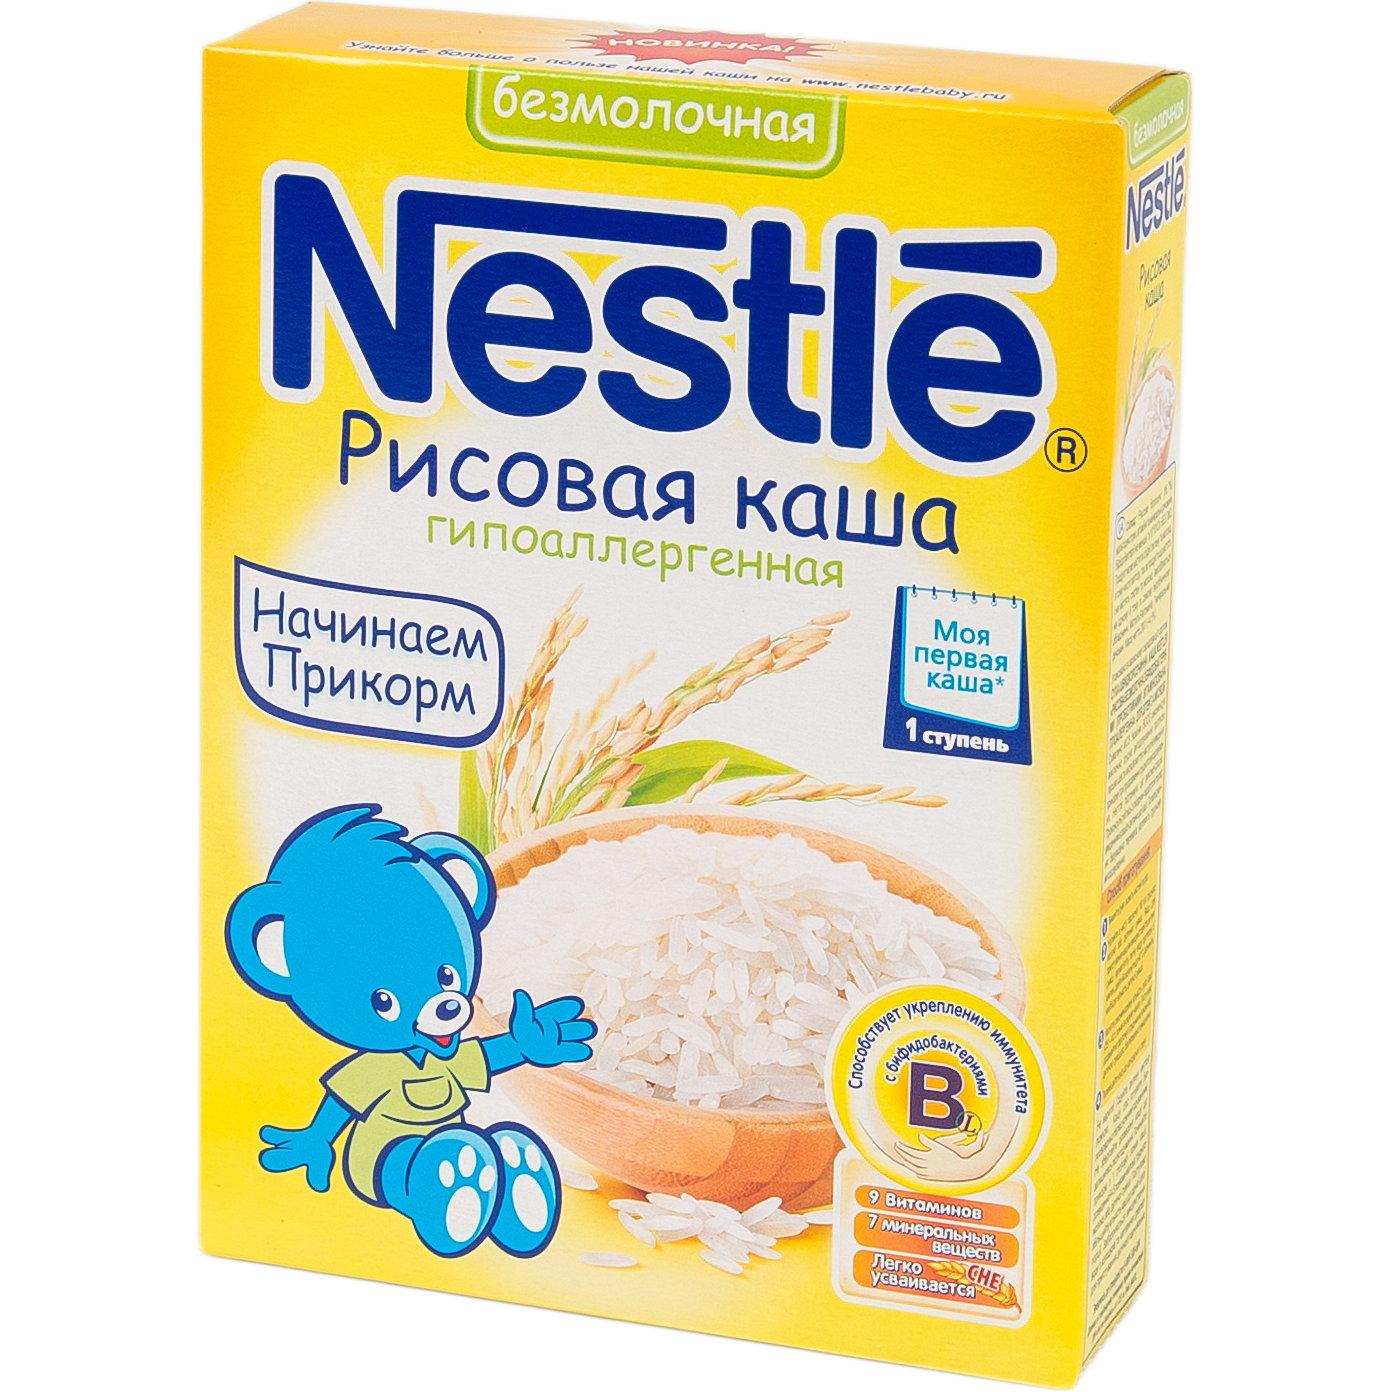 Каша Nestle безмолочная 200 гр Рисовая низкоаллергенная (1 ступень)<br>